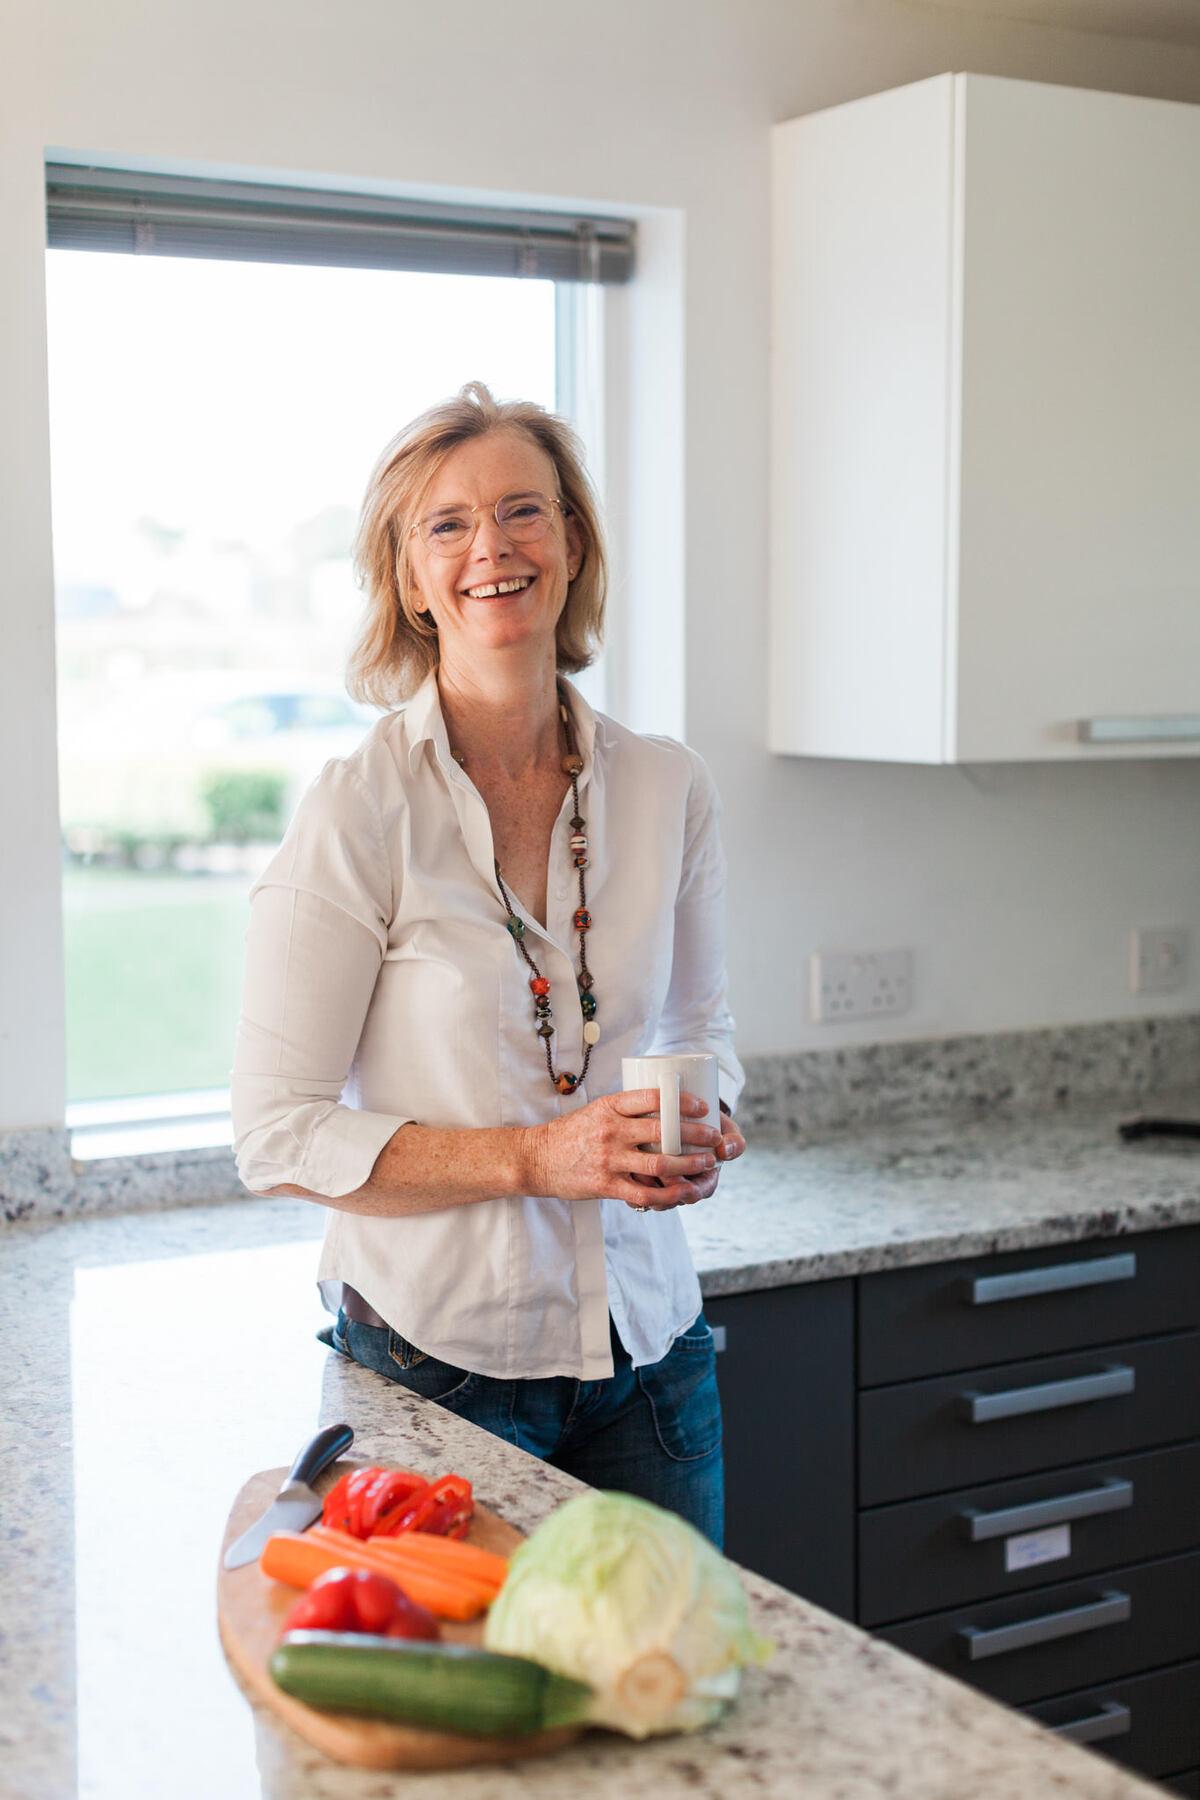 Branding shoot for female nutritionist in her kitchen